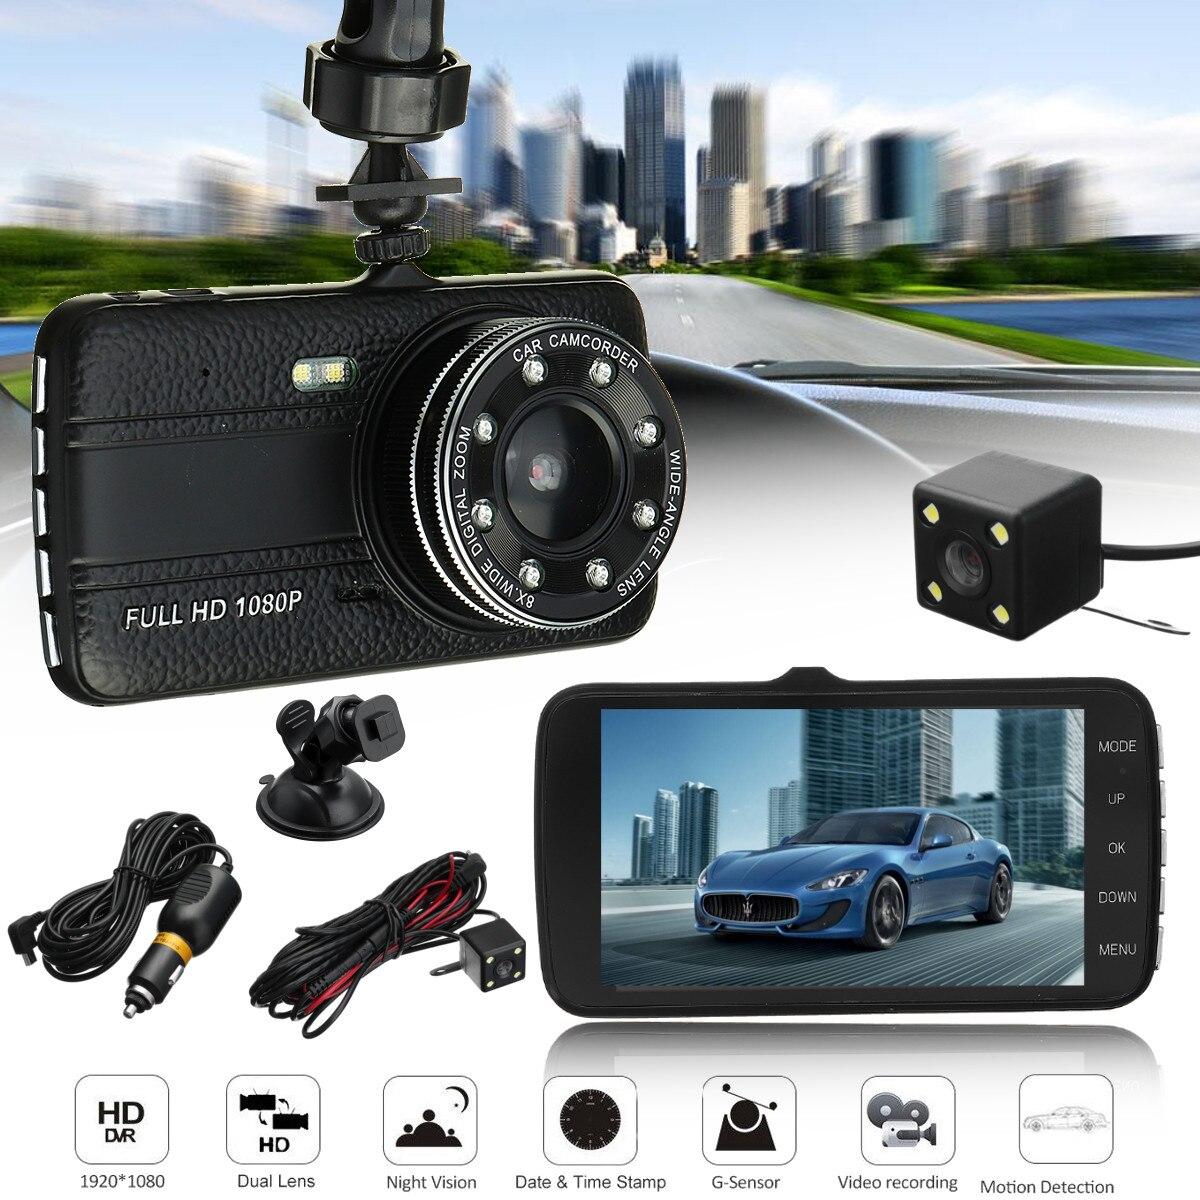 4inch Full screen IPS Screen Dual Lens Car DVR Camera Full HD 1080P Front+Rear View Camera Night Vision dash cam Parking Monitor